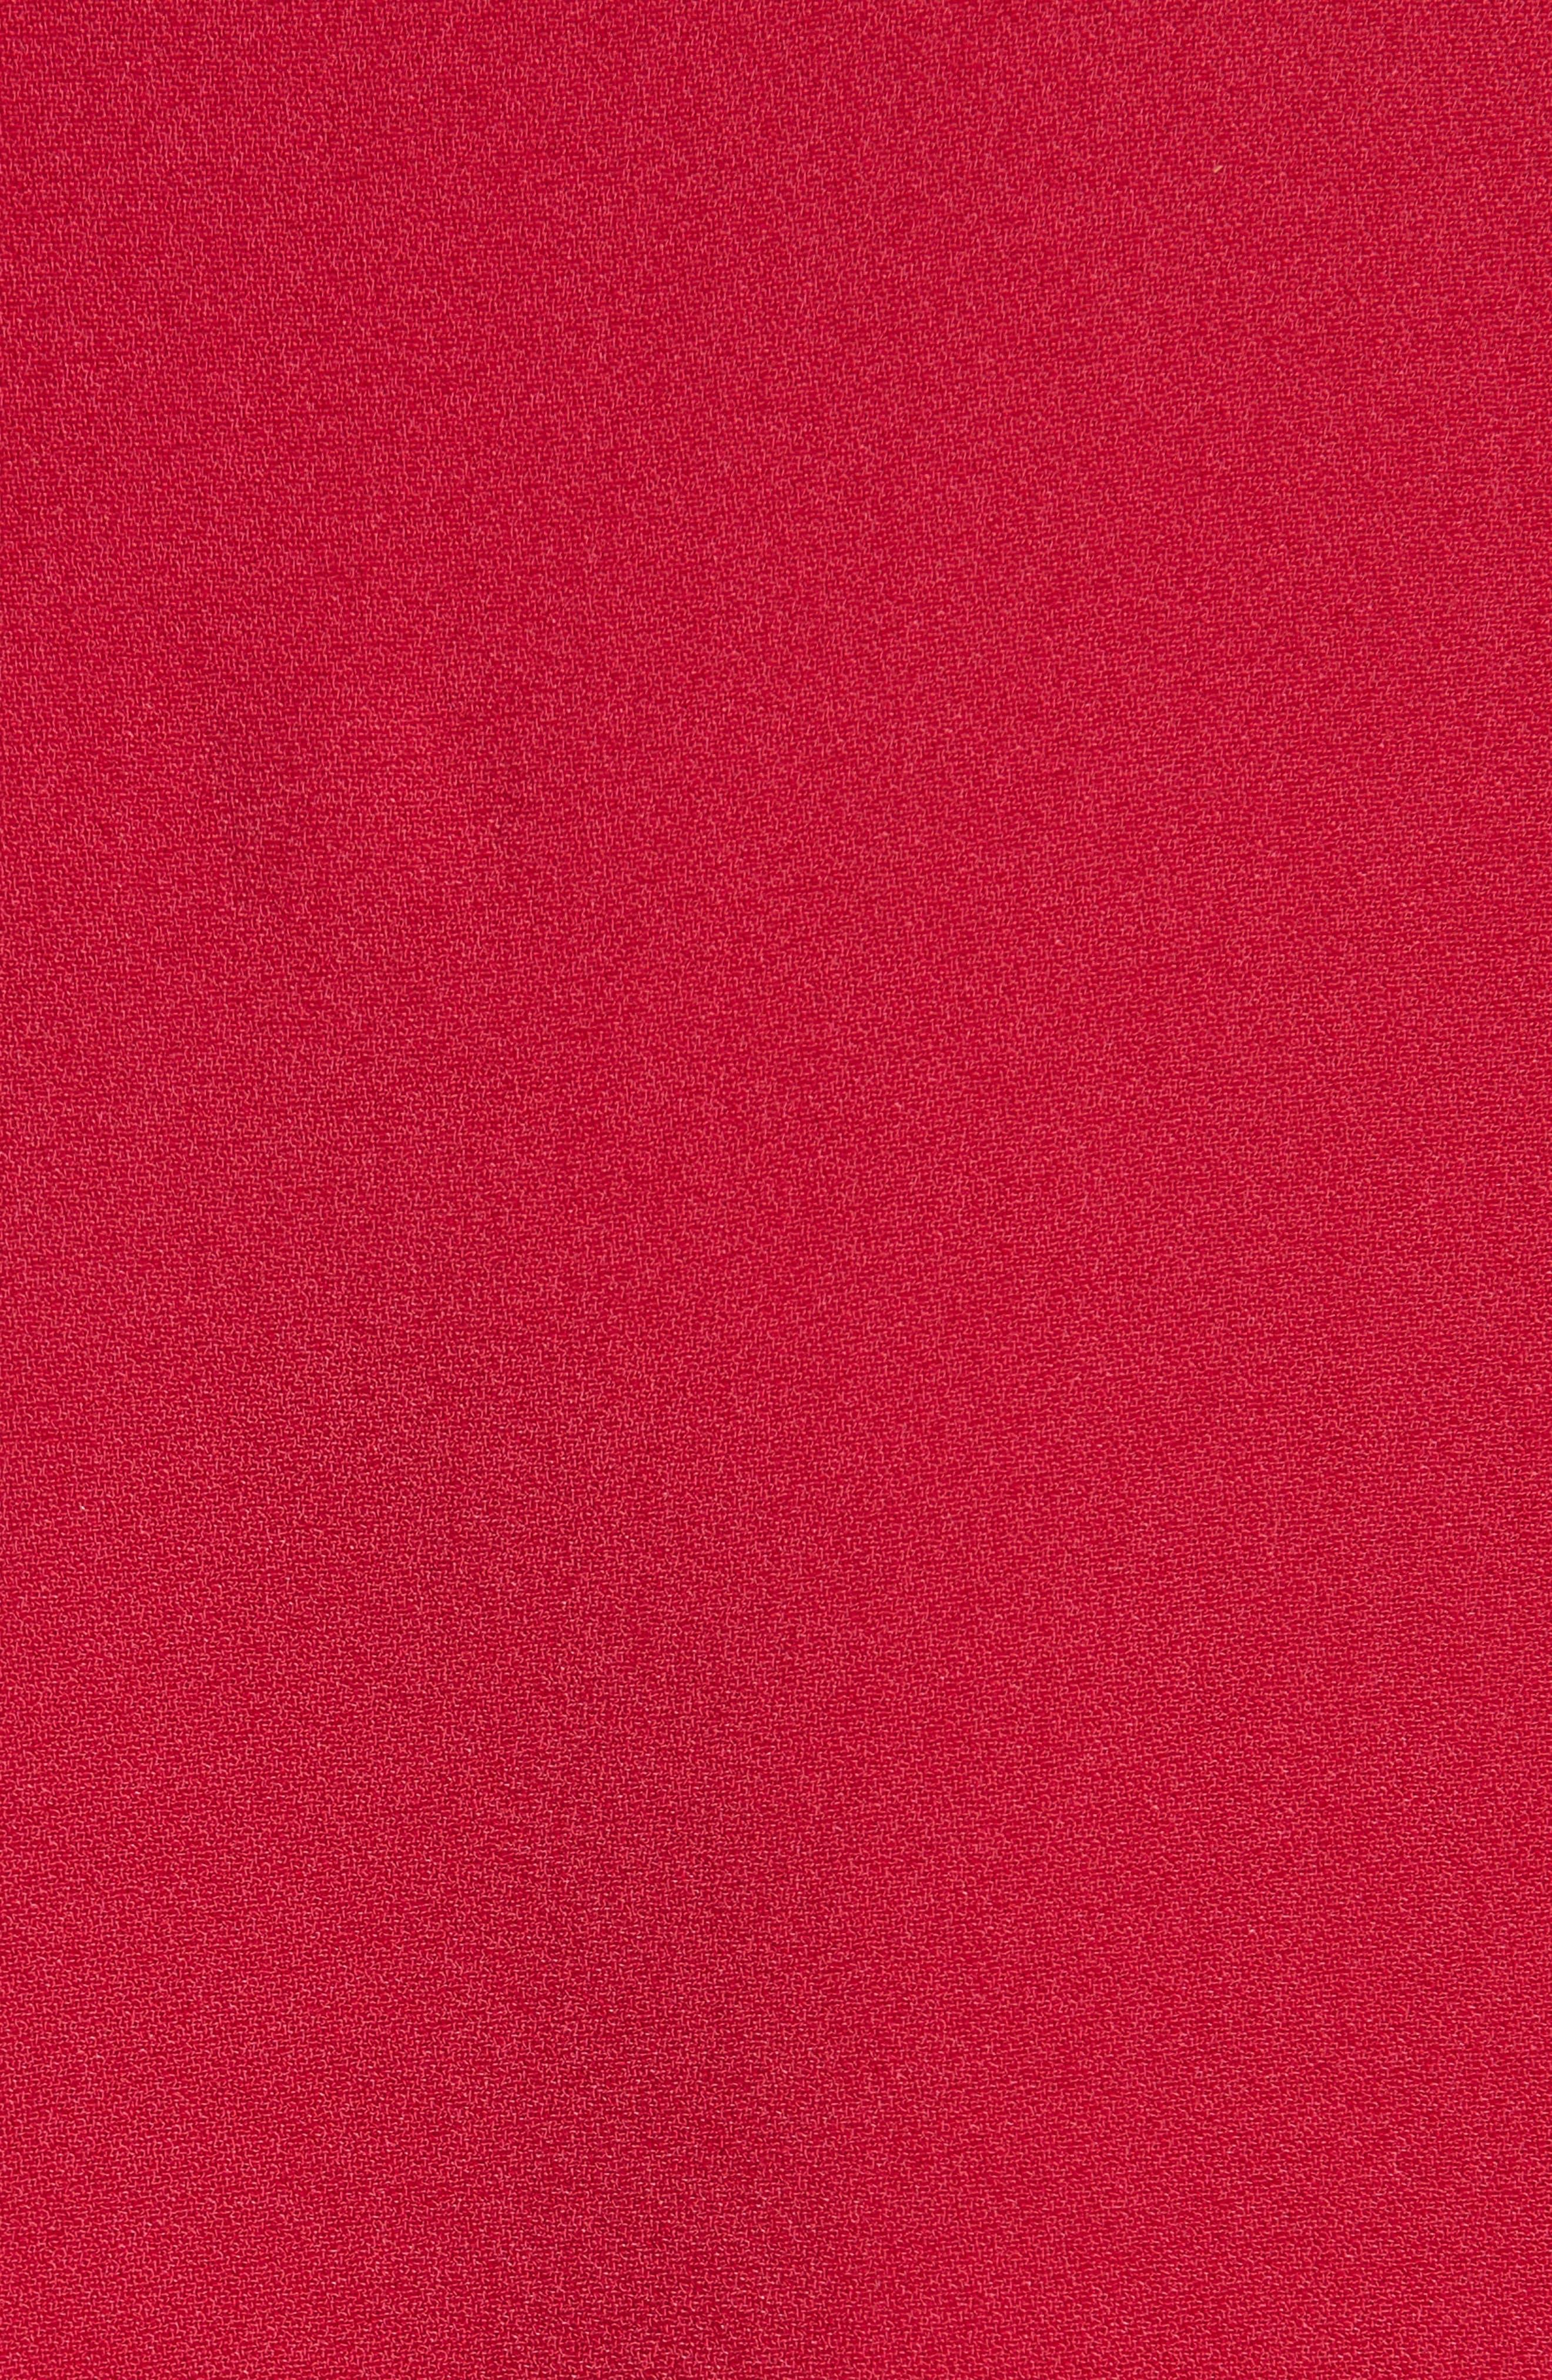 Alternate Image 3  - Stella McCartney Ruffle Hem Top